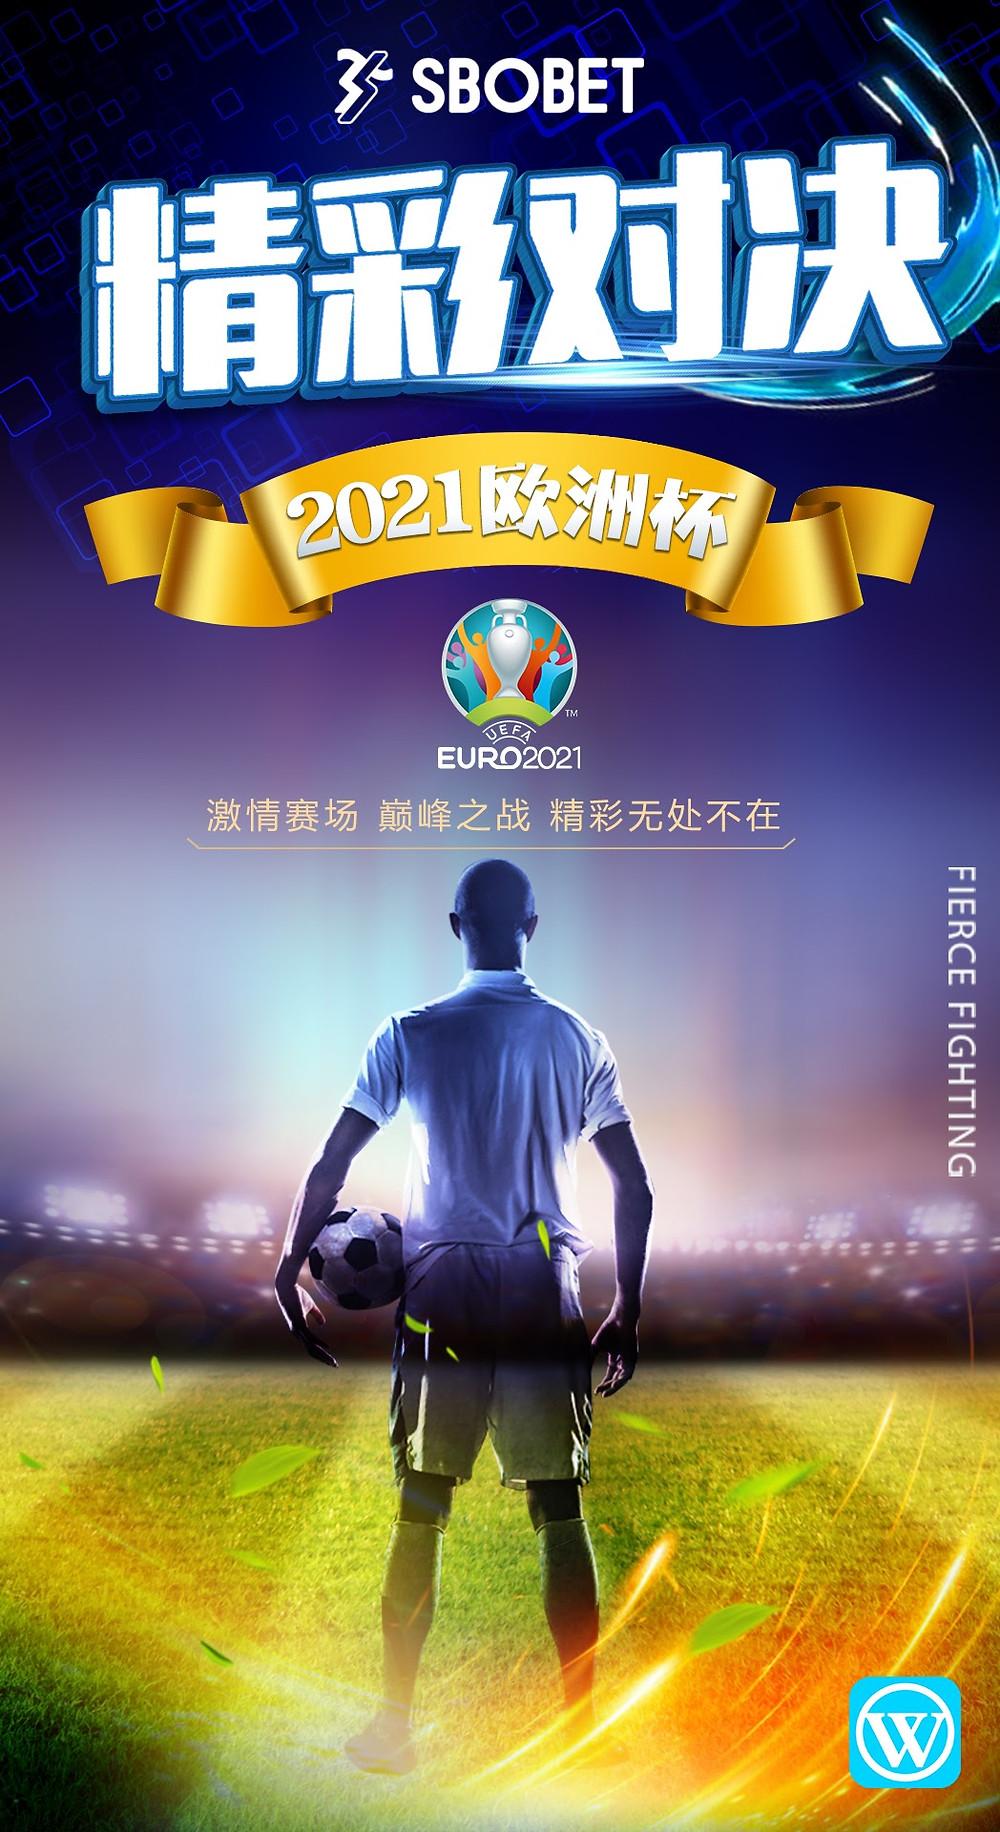 UEFA 2021 Group Schedule France VS Portugal